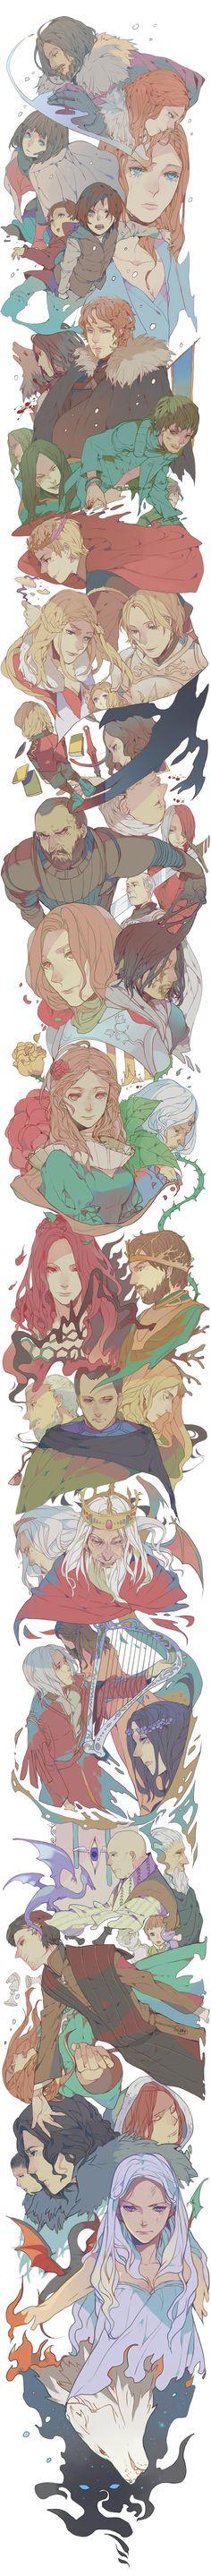 Anime/Manga-Style Game of Thrones Art